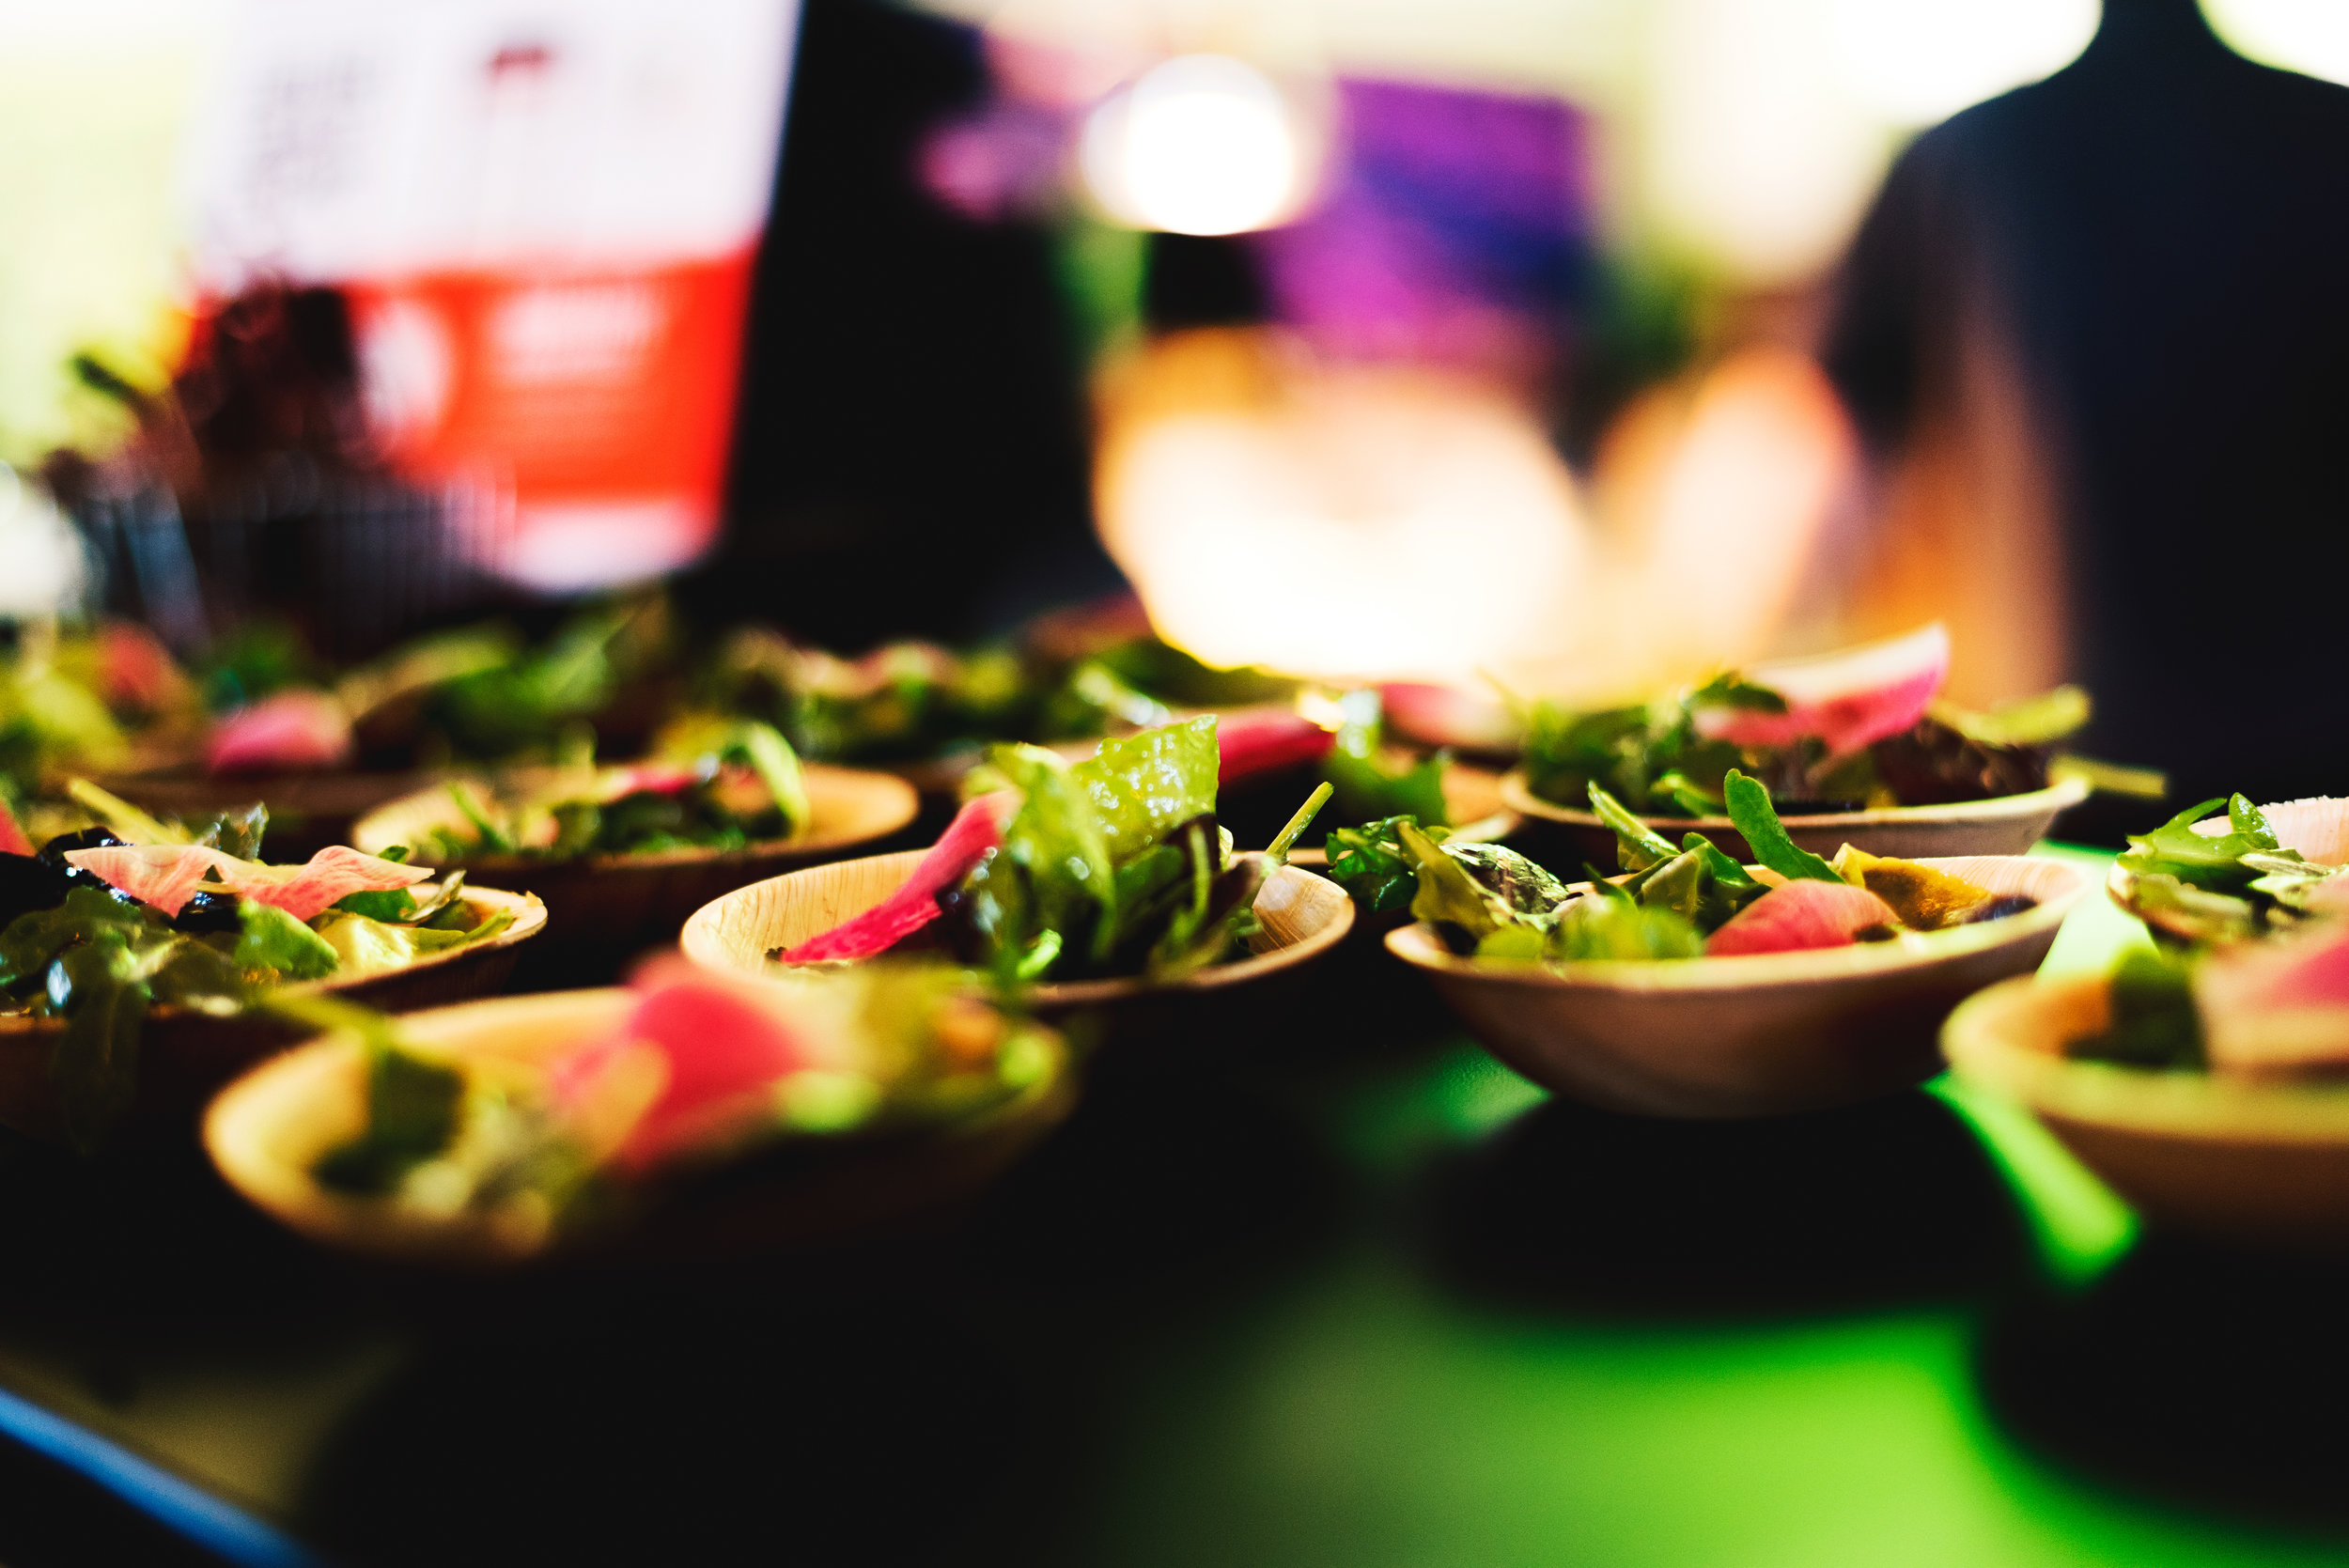 FoodFanaticsLive-Event-Food-Photography043.jpg